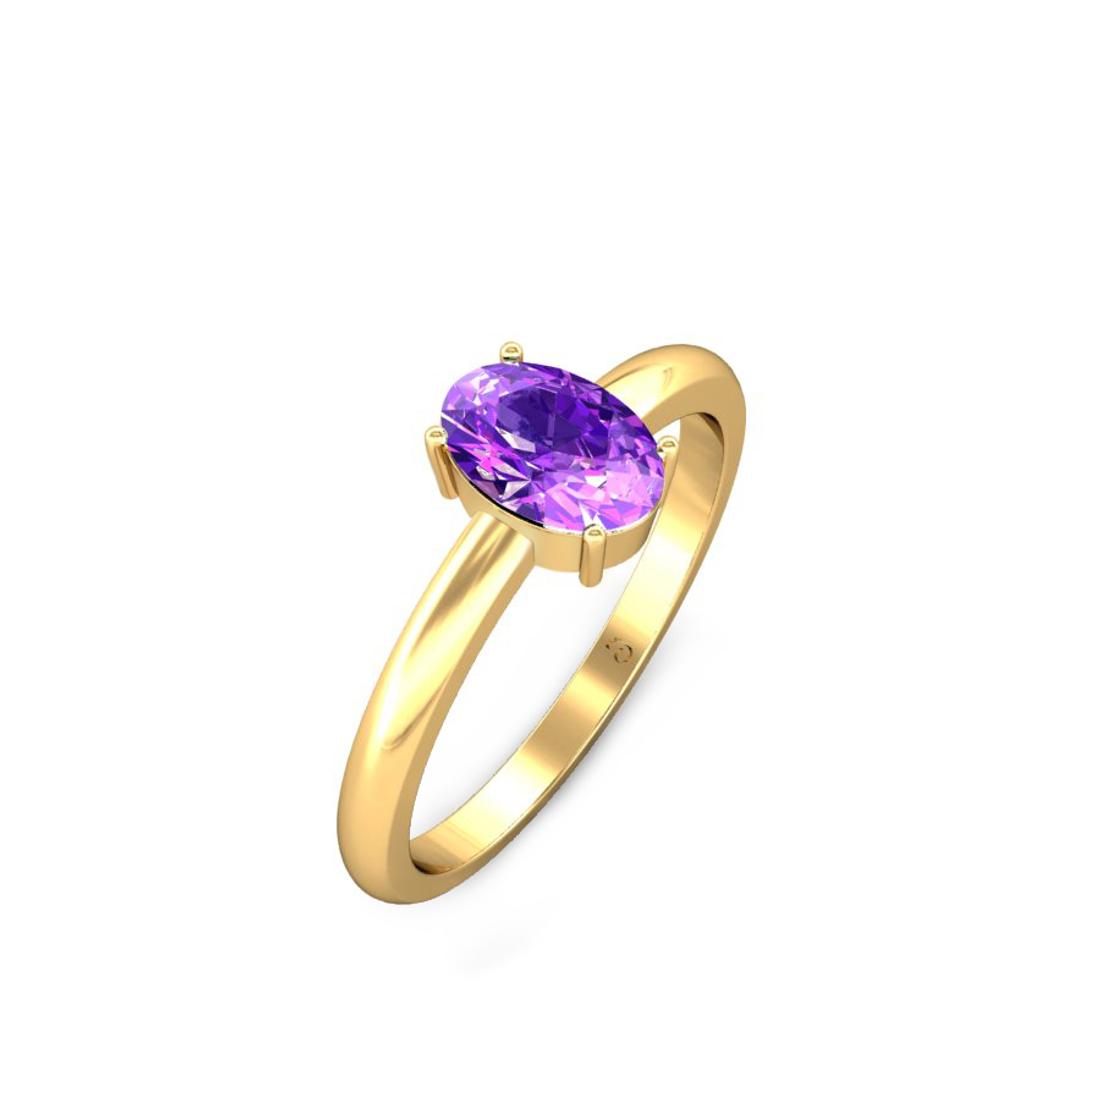 Jewel samarth 18k(750) BIS Hallmark Yellow Gold  Ayesha Amethyst Ring (CGL Certified)